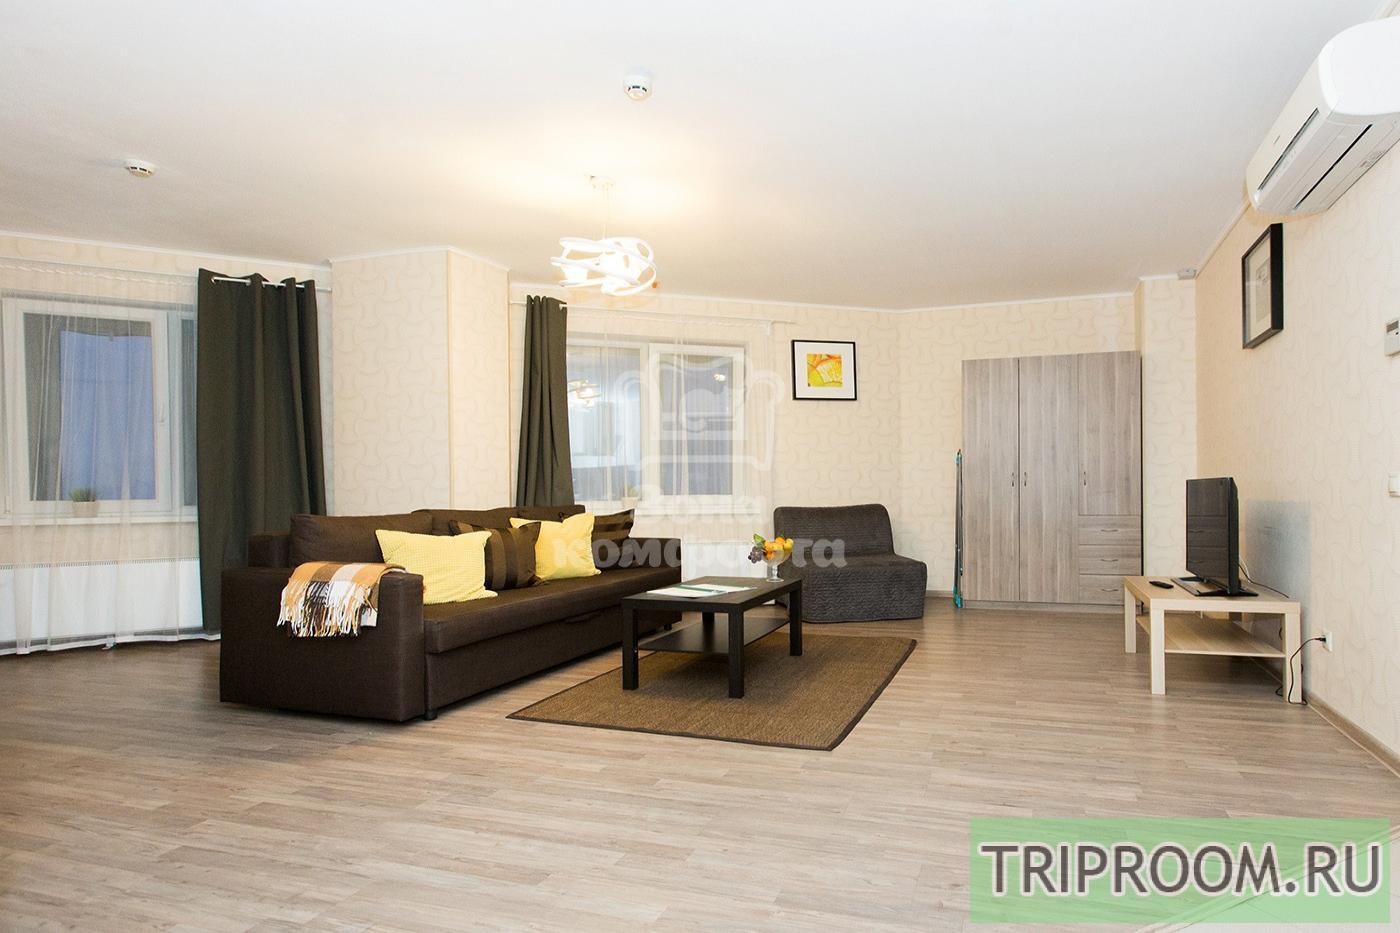 2-комнатная квартира посуточно (вариант № 34715), ул. Гагарина бульвар, фото № 16